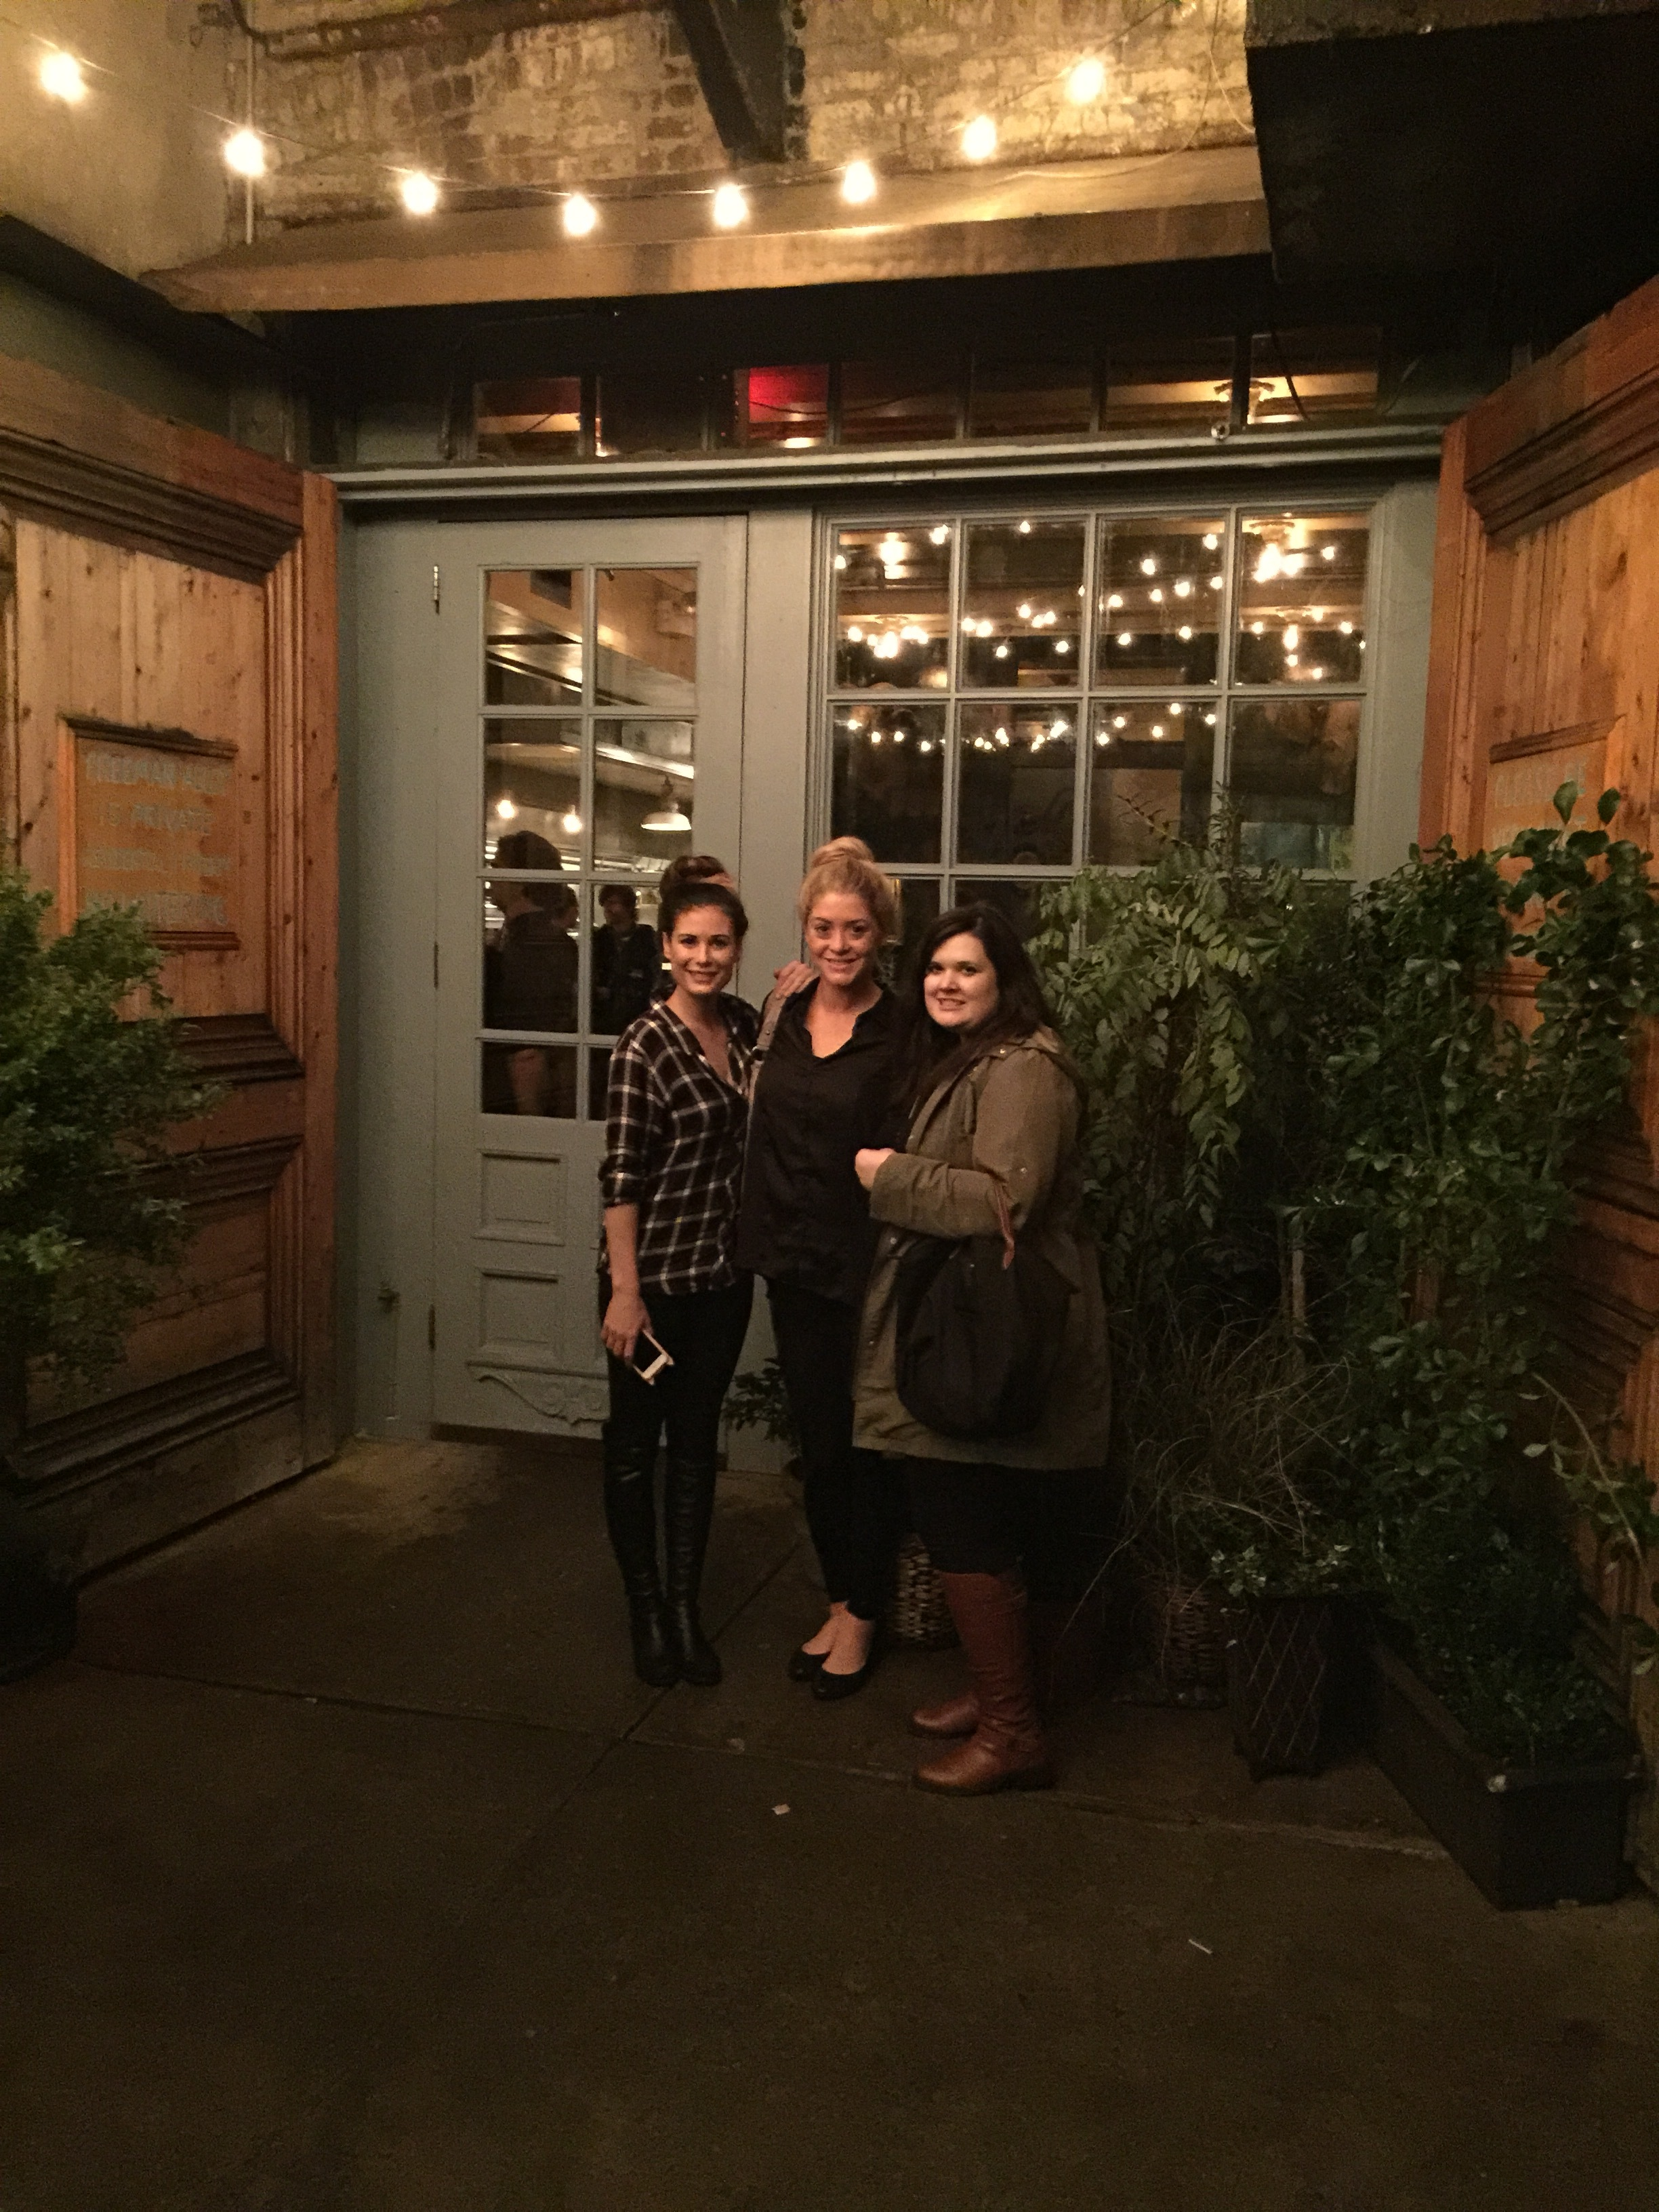 Kara, Morgan and Ella outside Freeman's Restaurant. iPhone photo by Teresa Leonard.